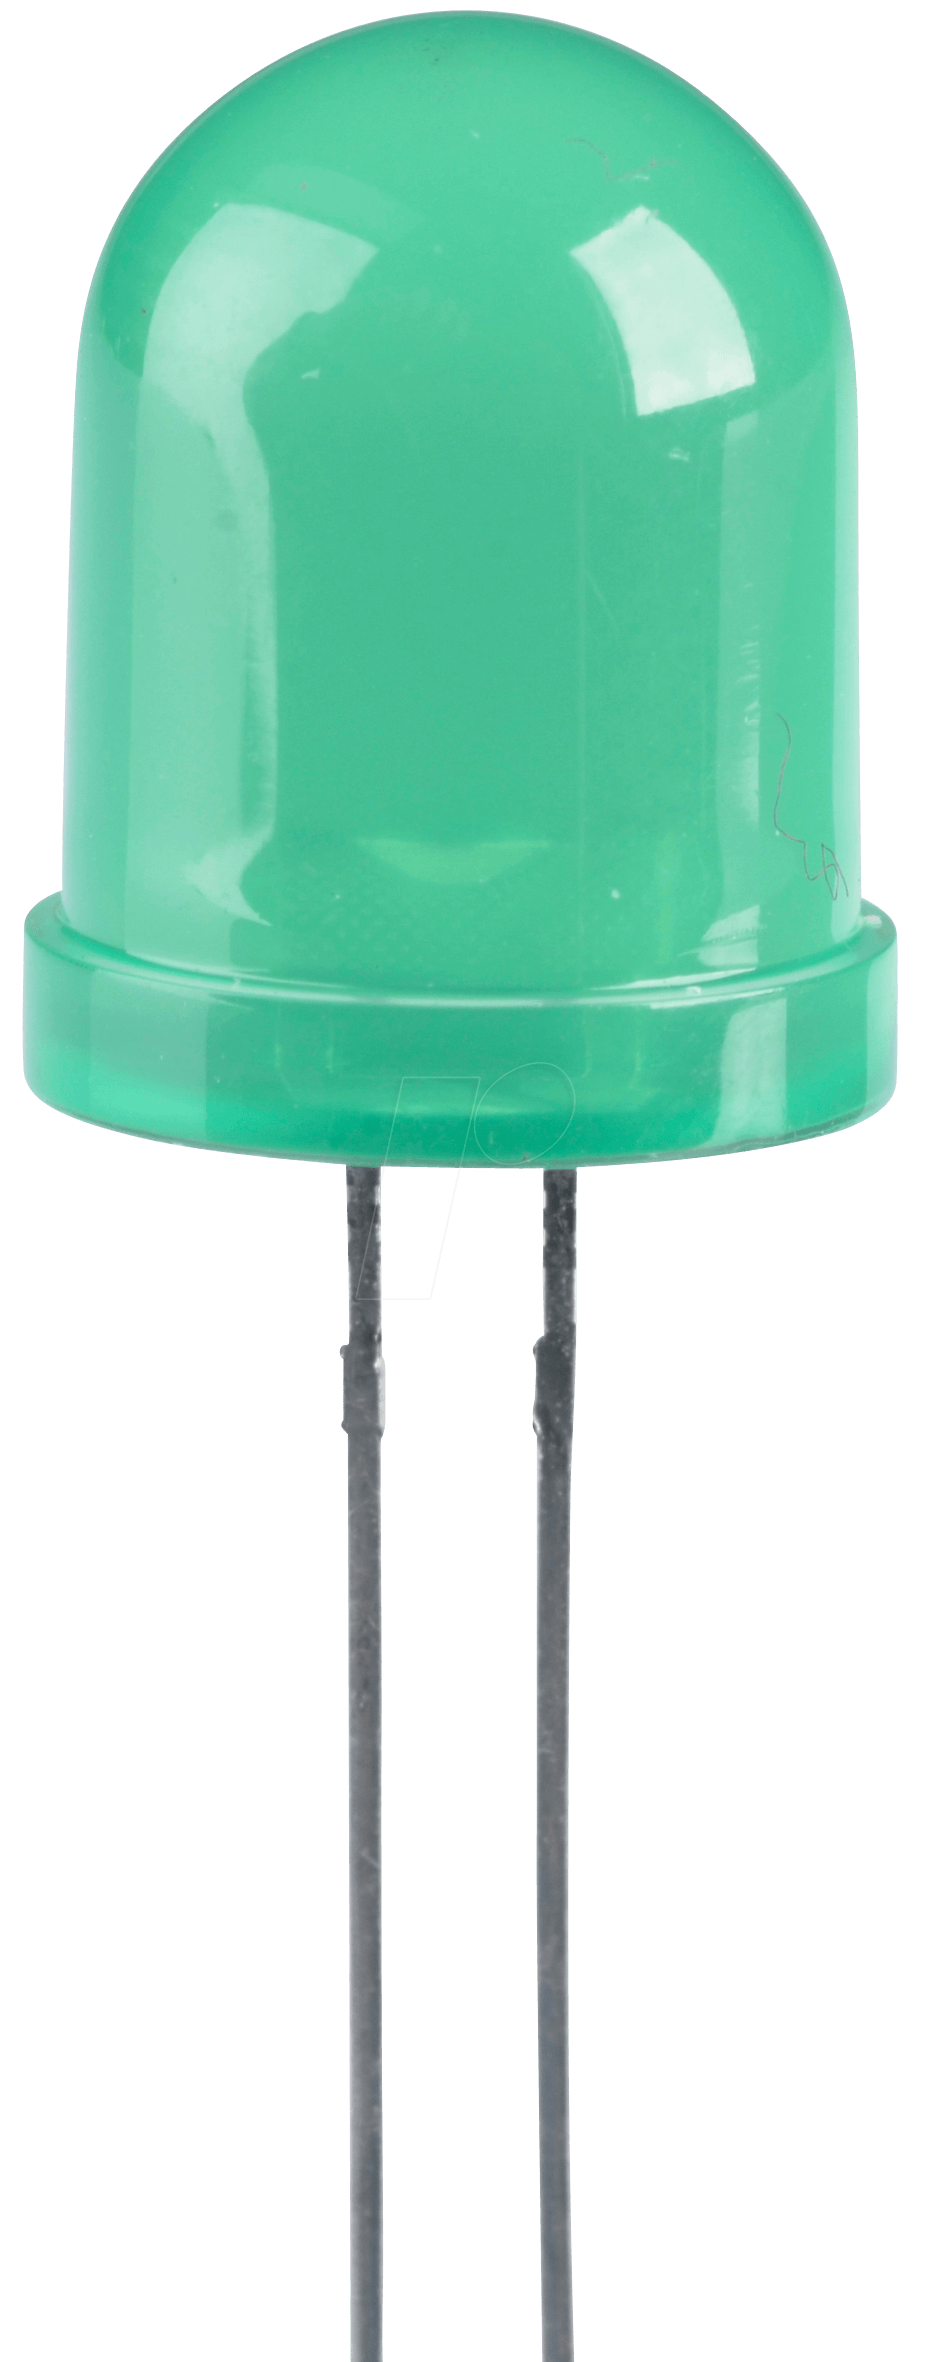 LED 10MM GN - LED, 10 mm, bedrahtet, grün, 60 mcd, 60°